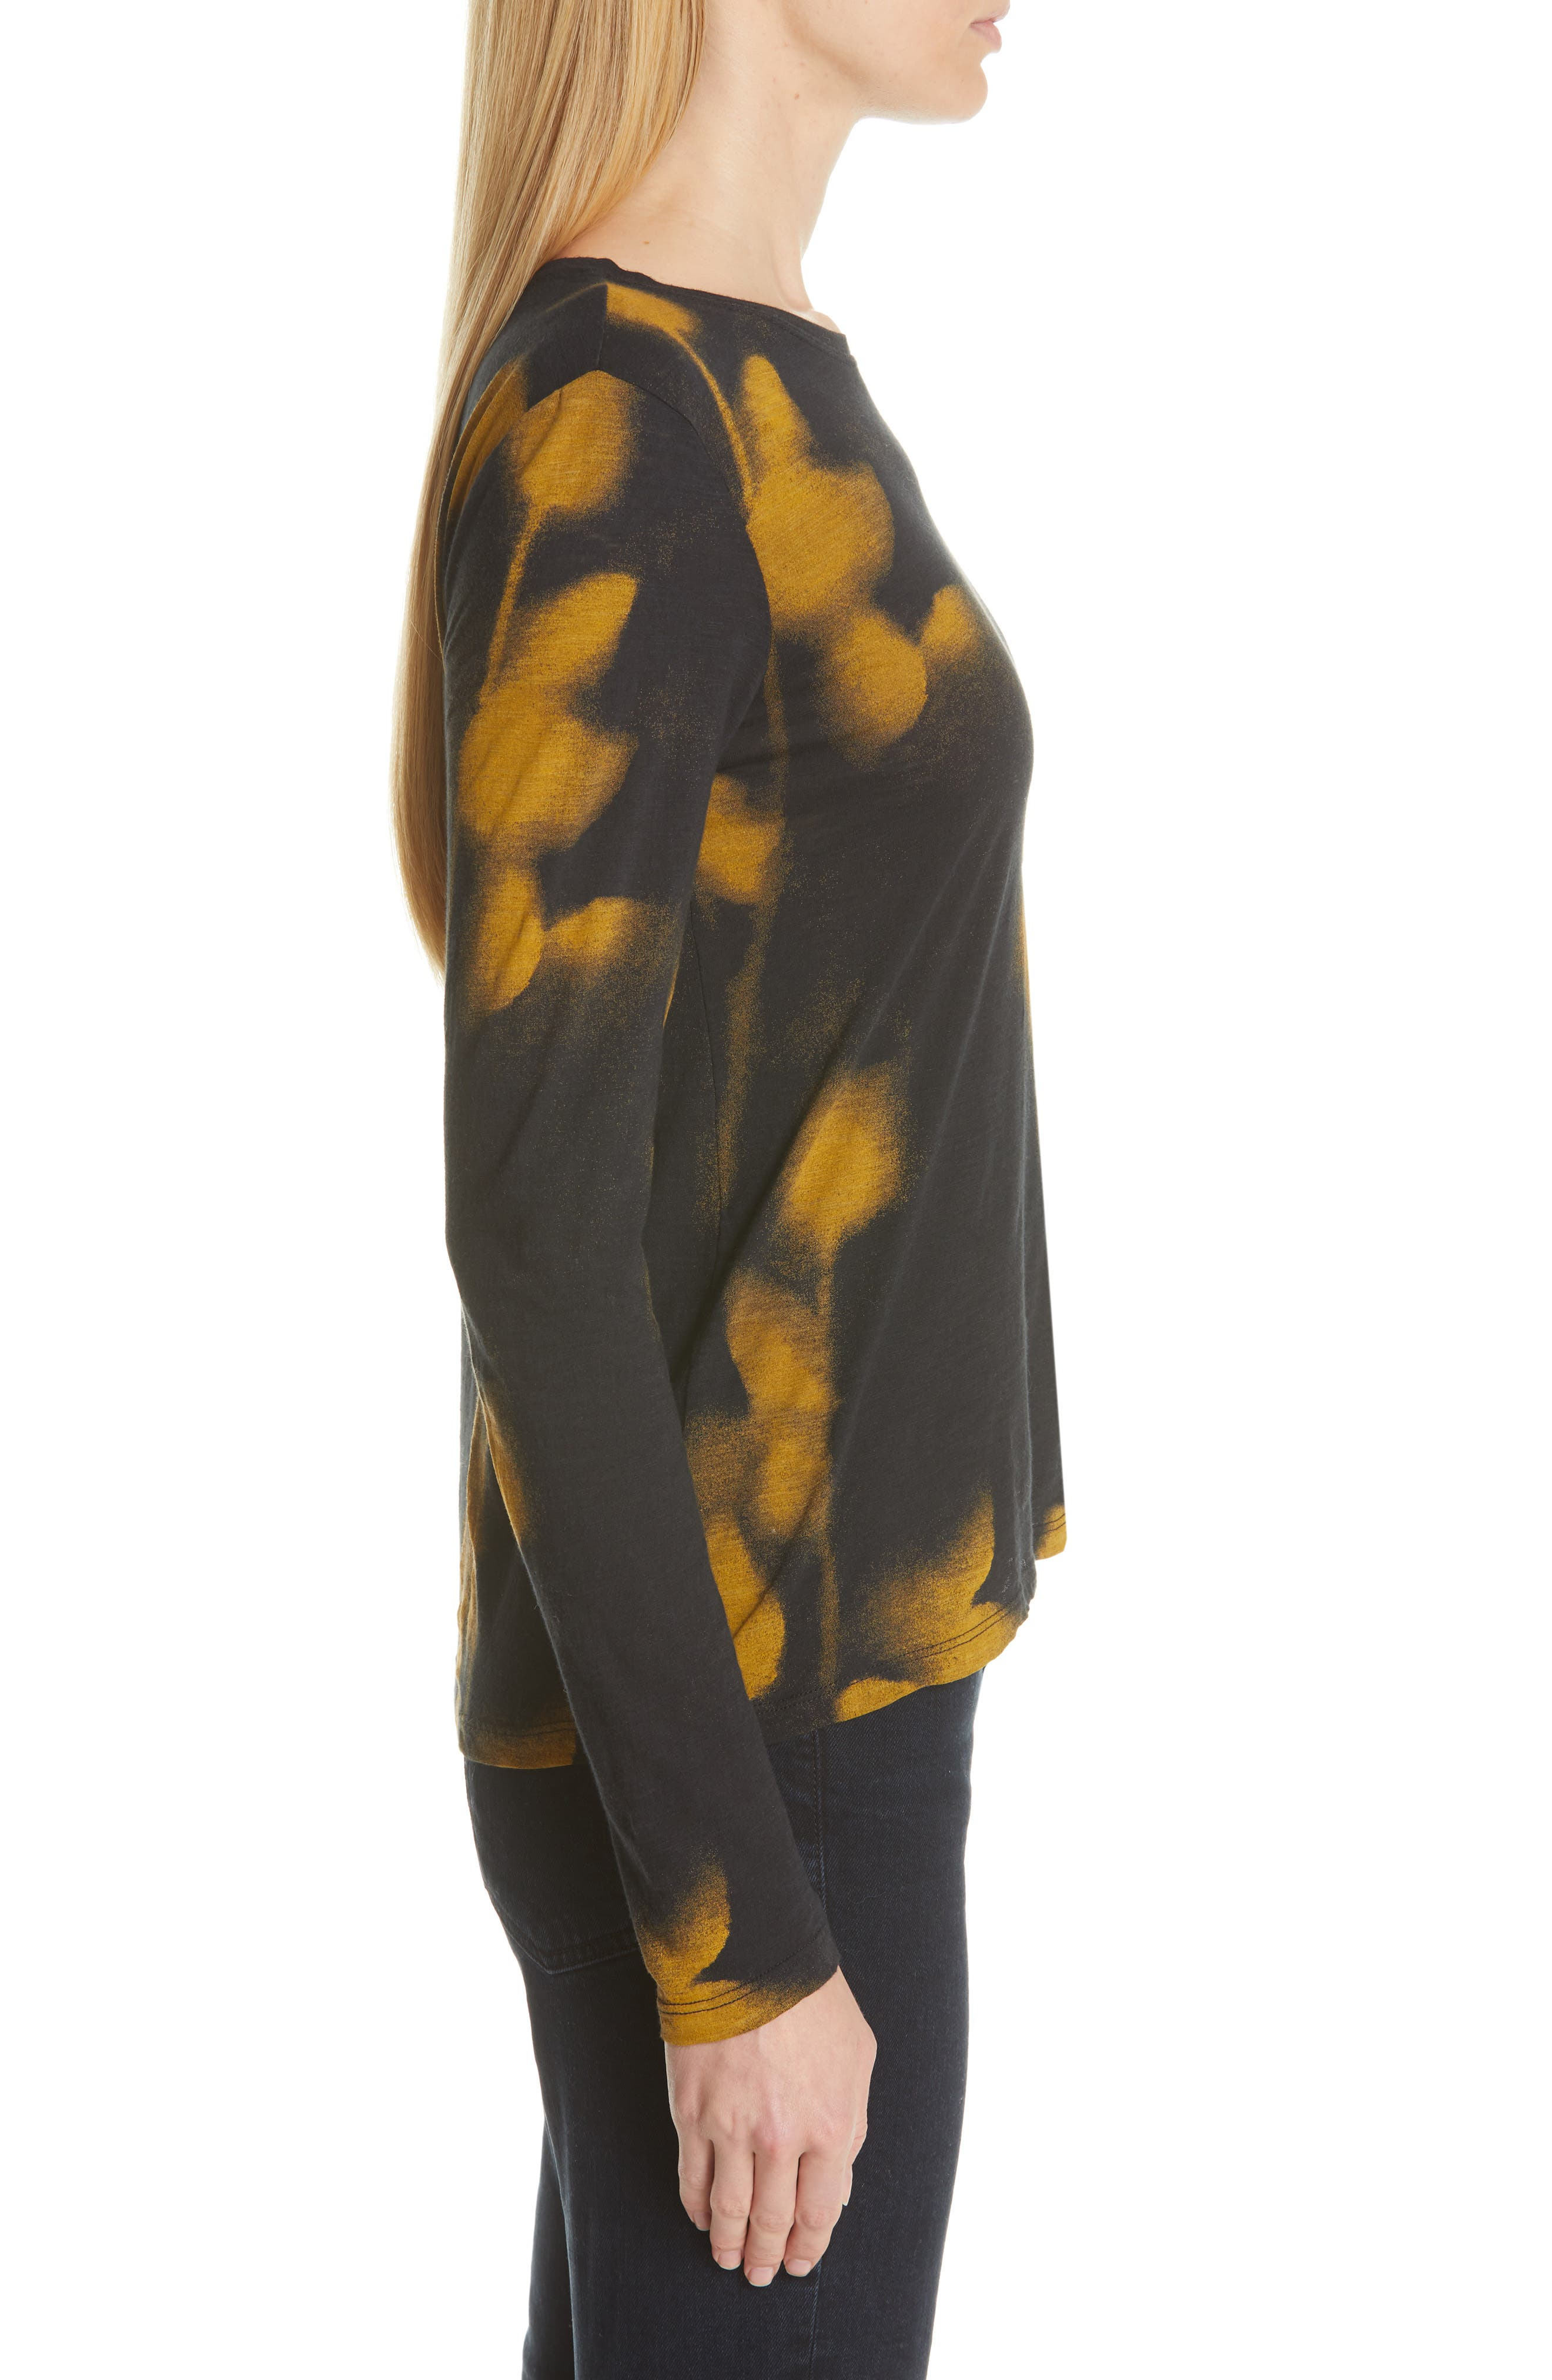 PROENZA SCHOULER, Print Jersey Tee, Alternate thumbnail 3, color, YELLOW/ BLACK ROSE PRINT